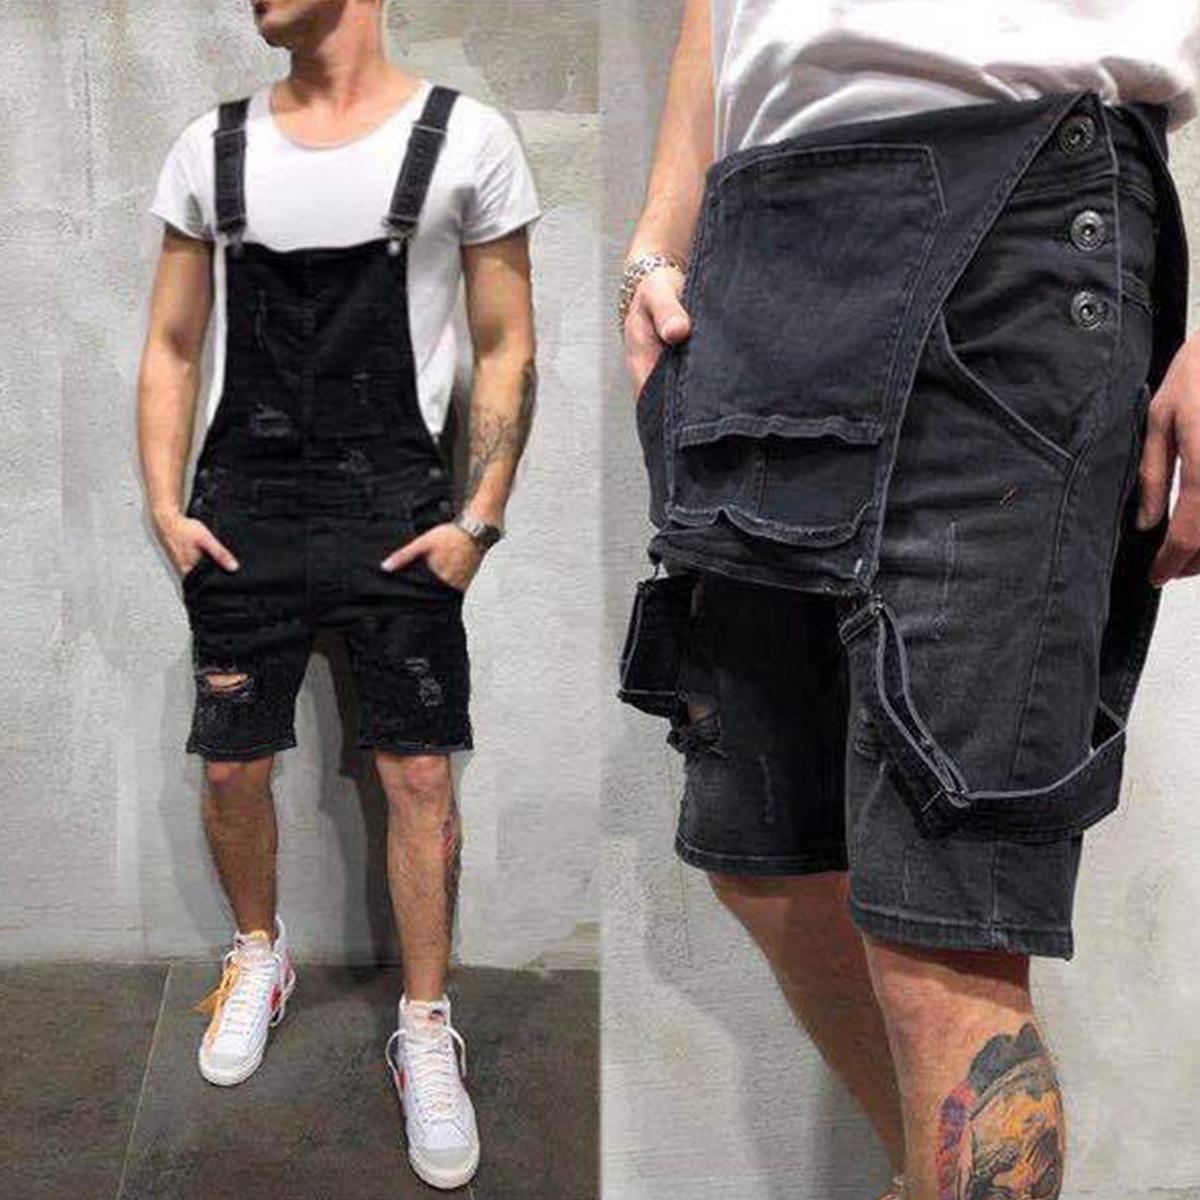 Correa-De-Hombre-Denim-Jeans-Mono-Mono-corto-Dungaree-Pantalones-Cortos-Deshilachados-Babero-En miniatura 17